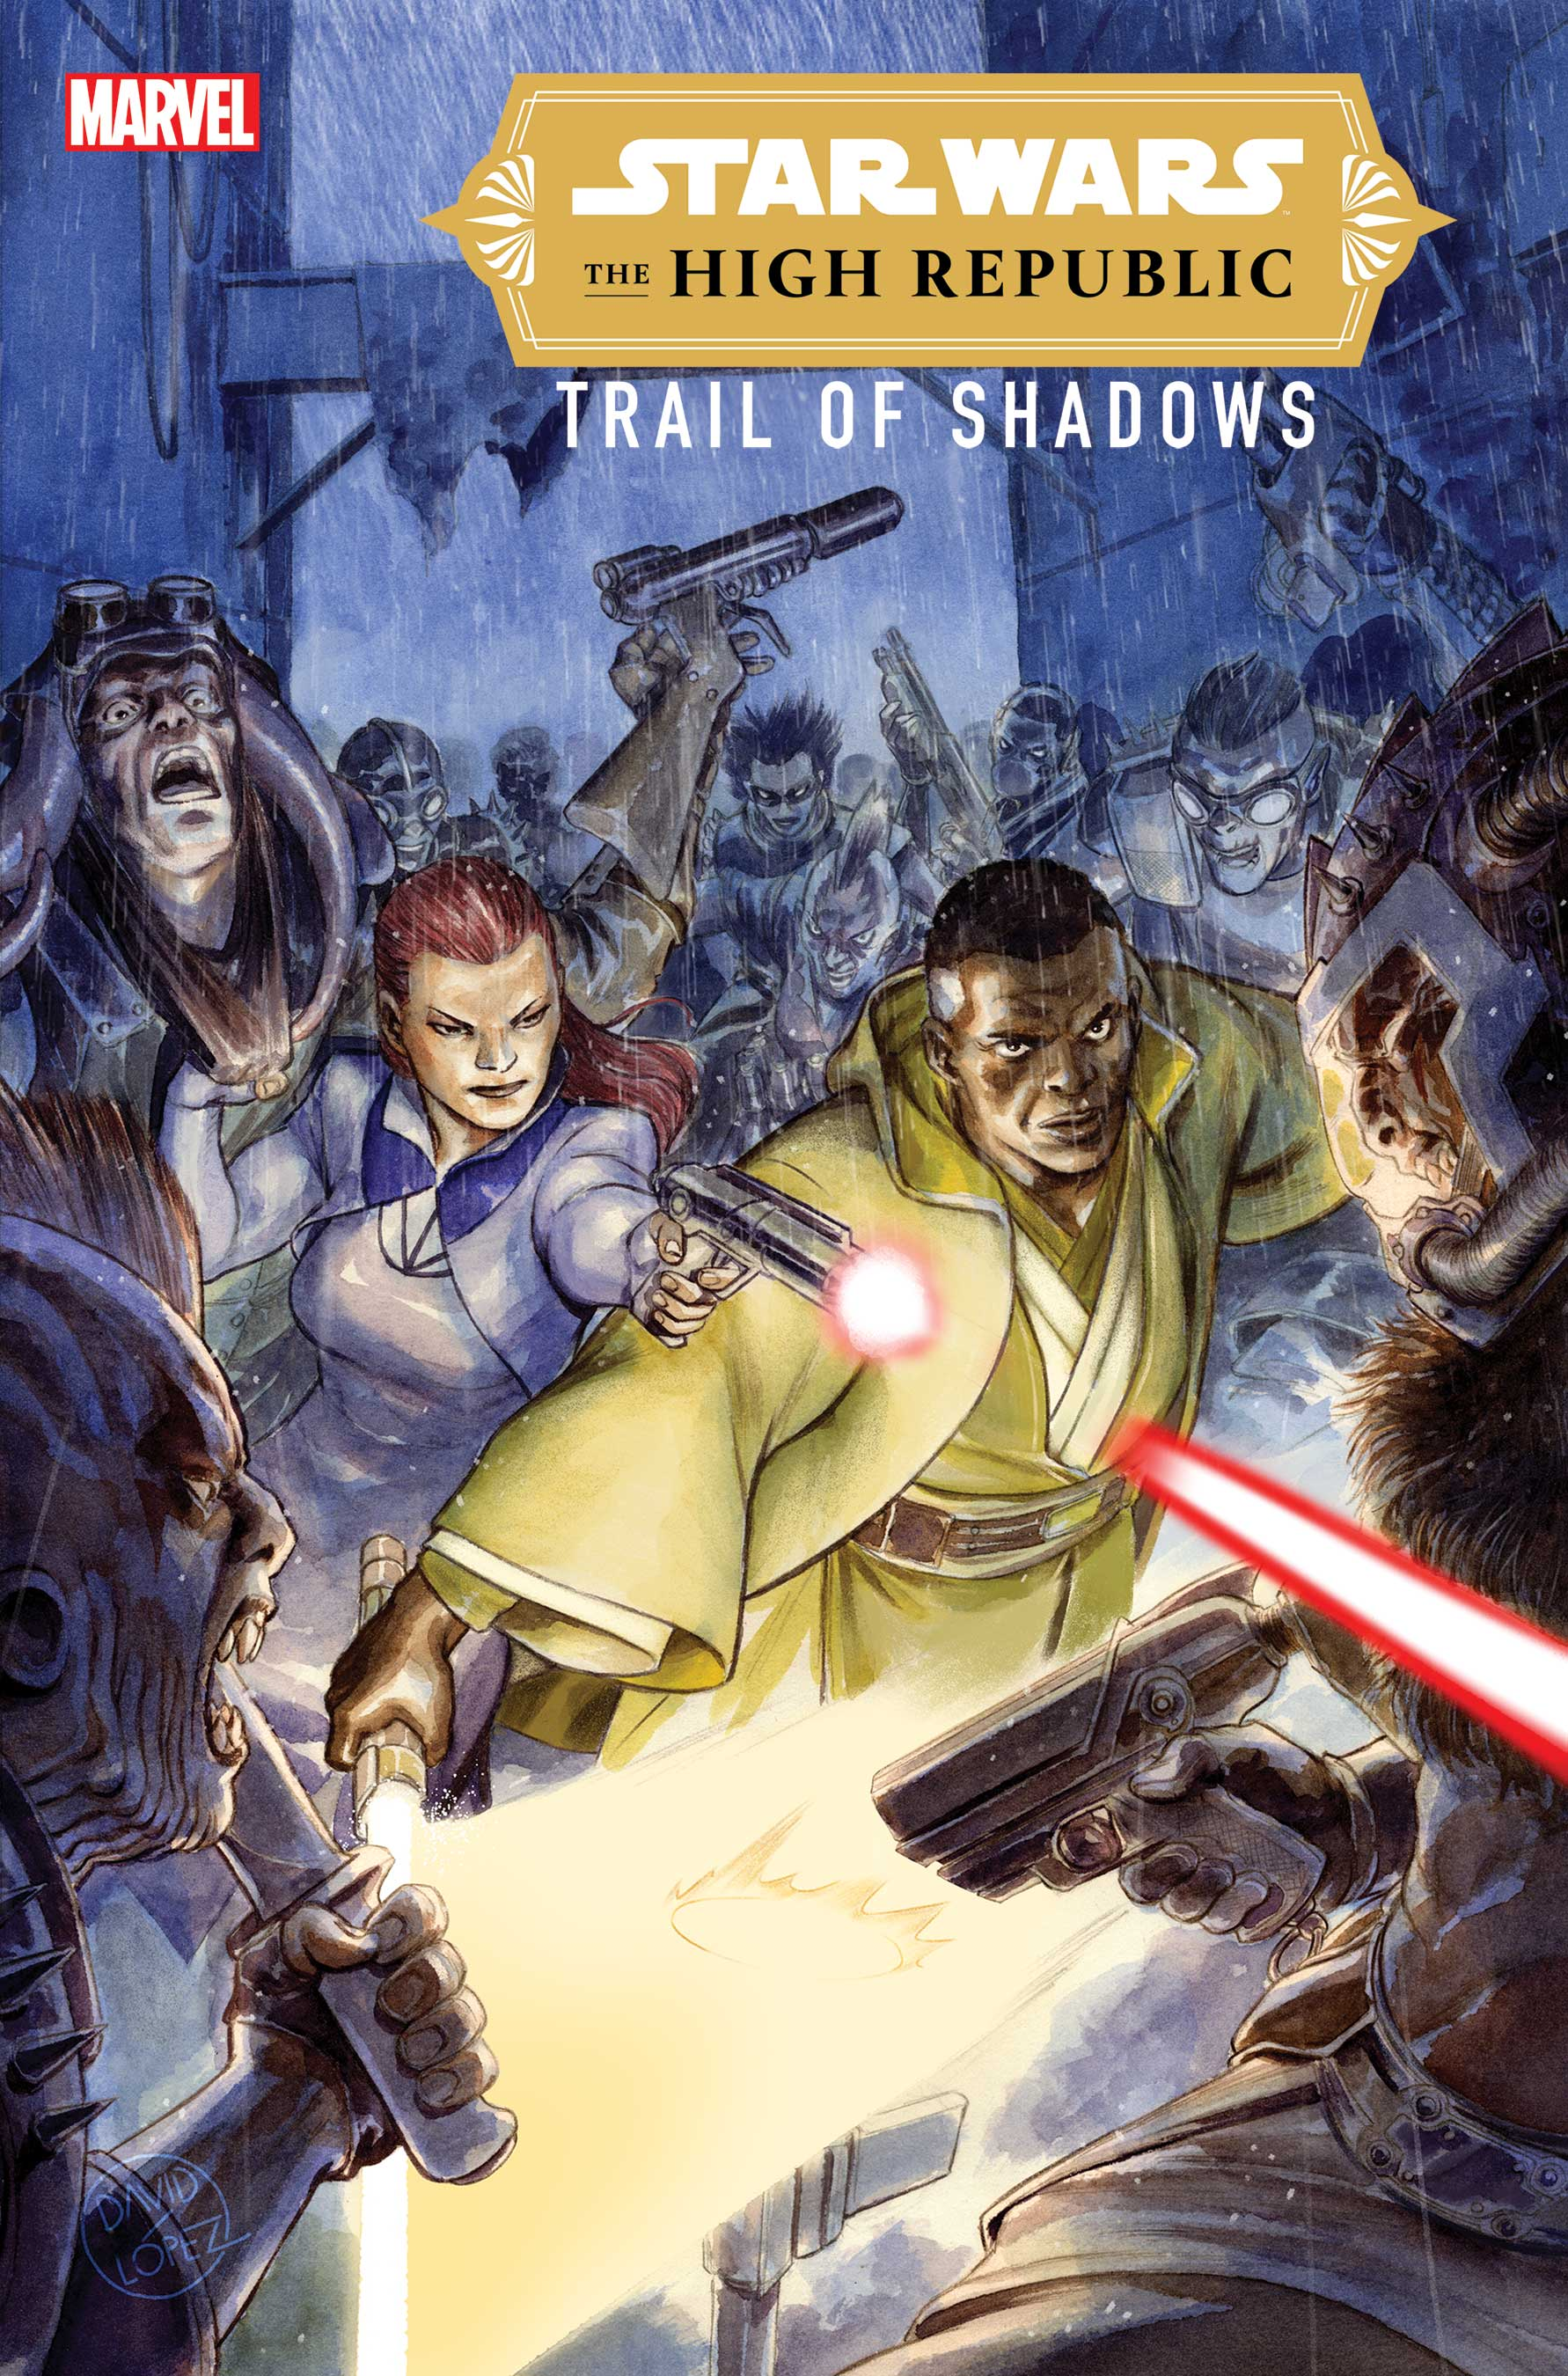 Star Wars: The High Republic - Trail of Shadows (2021) #2